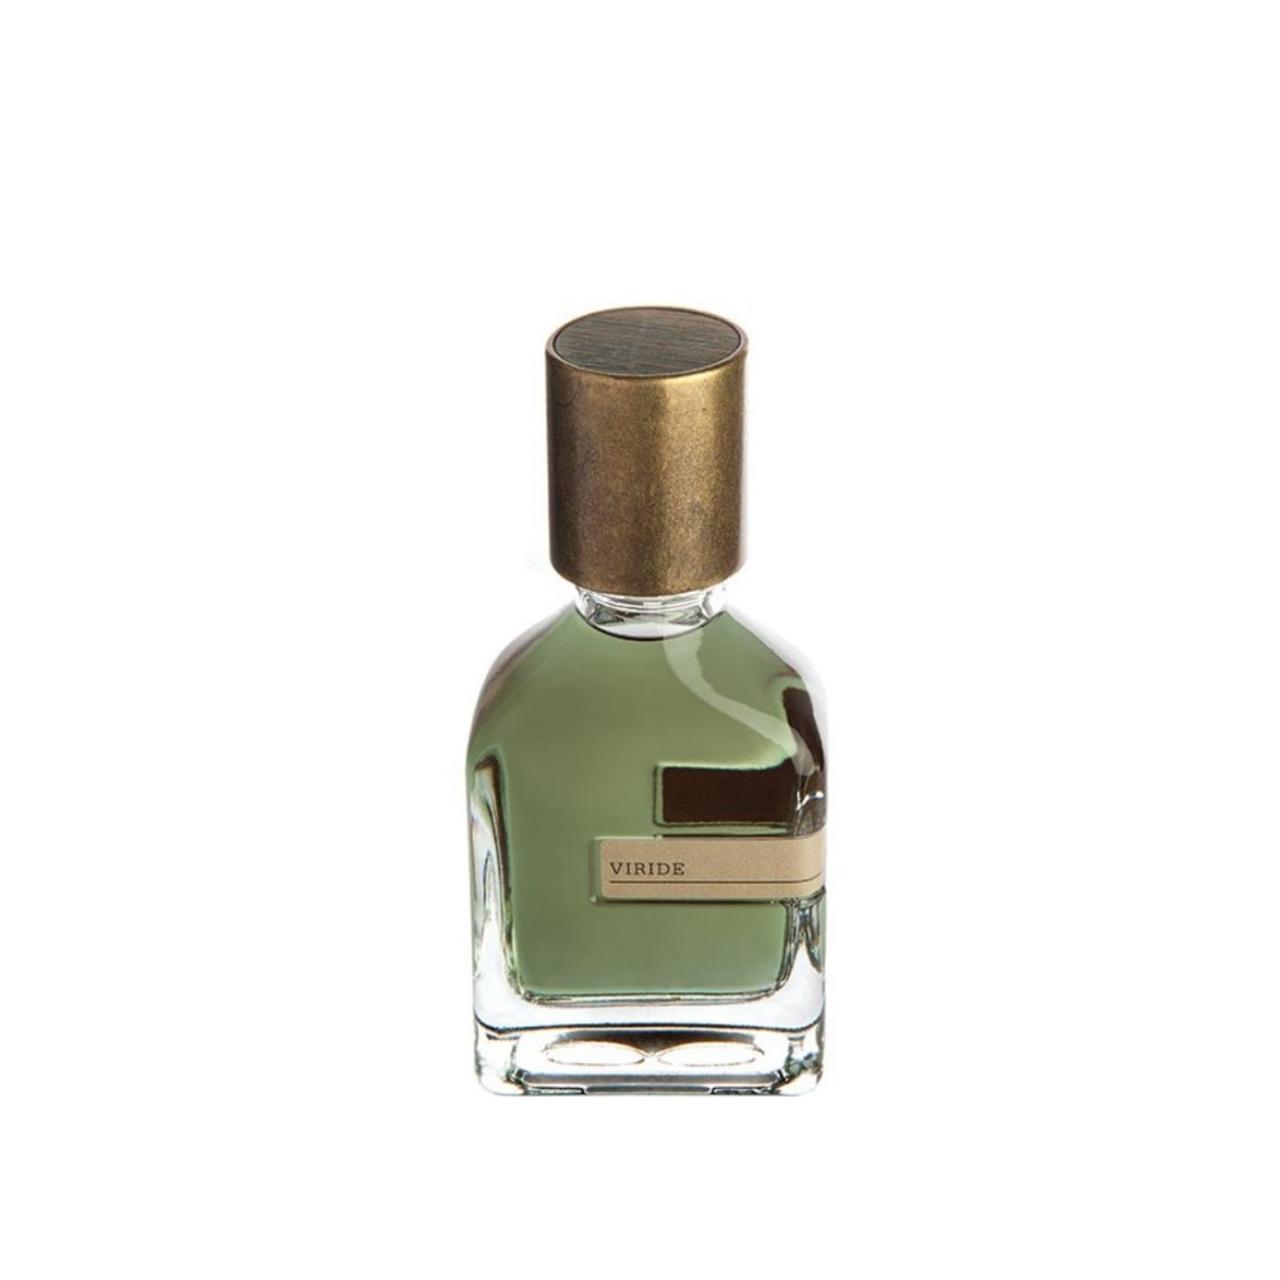 Viride - Eau de Parfum